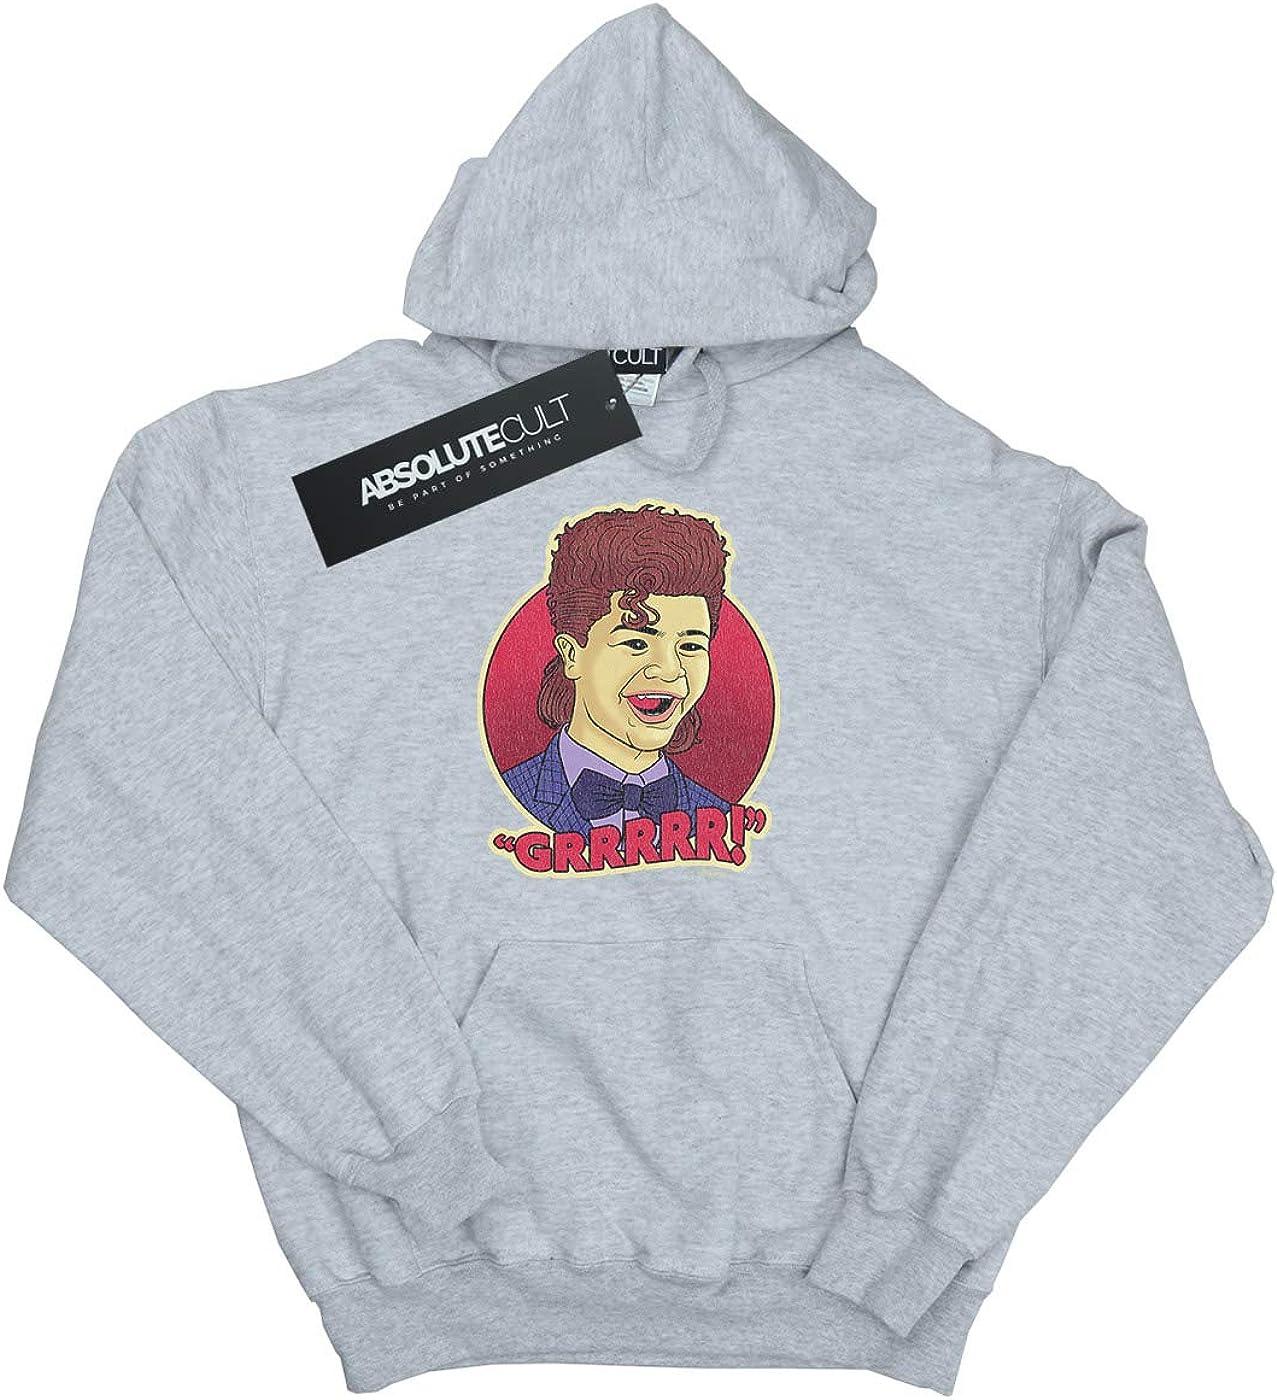 Absolute Cult Pennytees Girls Toxic Masculinity Sweatshirt